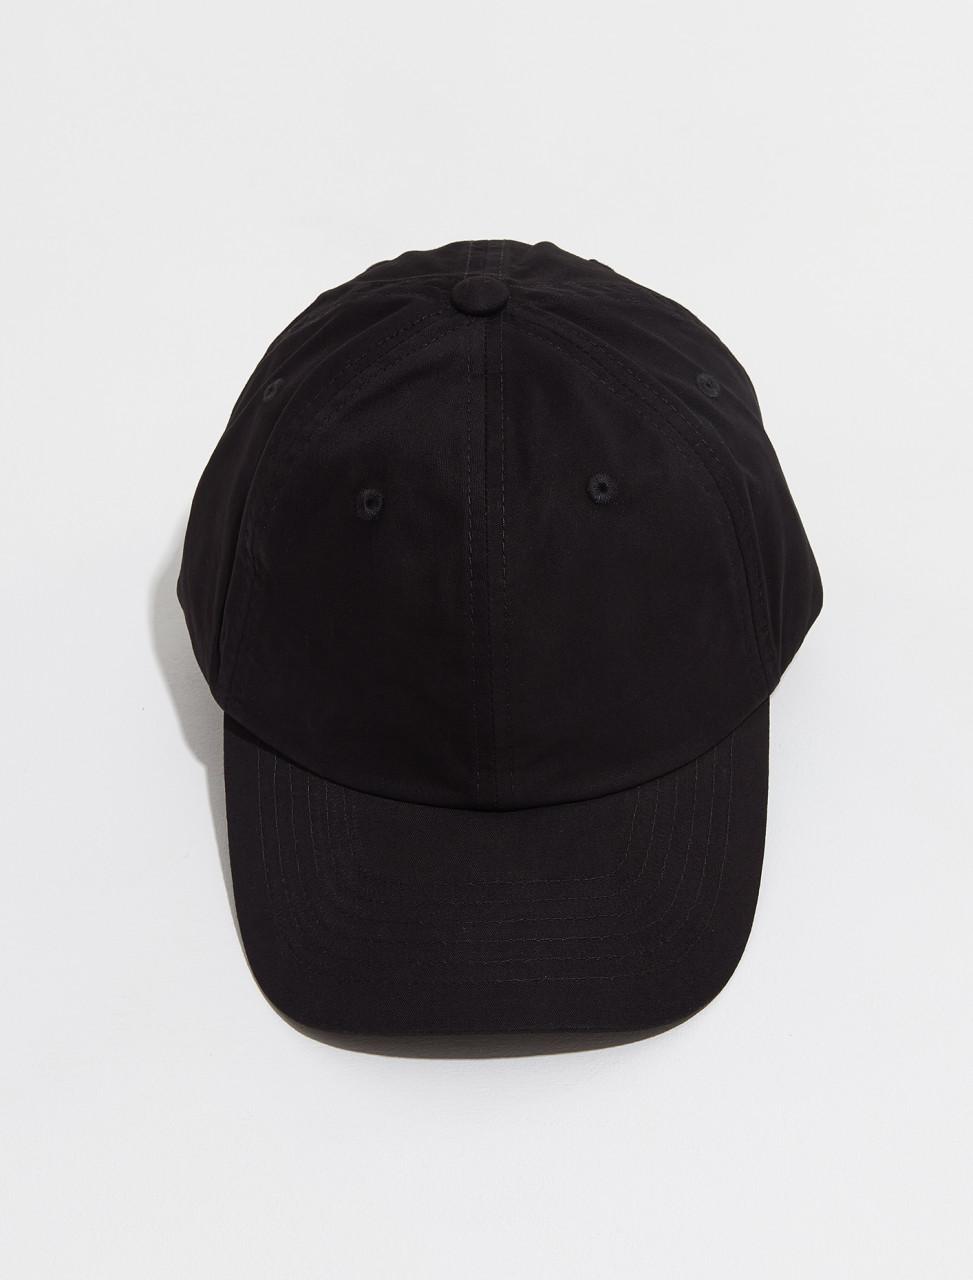 C40169 900 FA UX HATS000105 ACNE STUDIOS CUNOV LIGHT TWILL FACE CAP IN BLACK